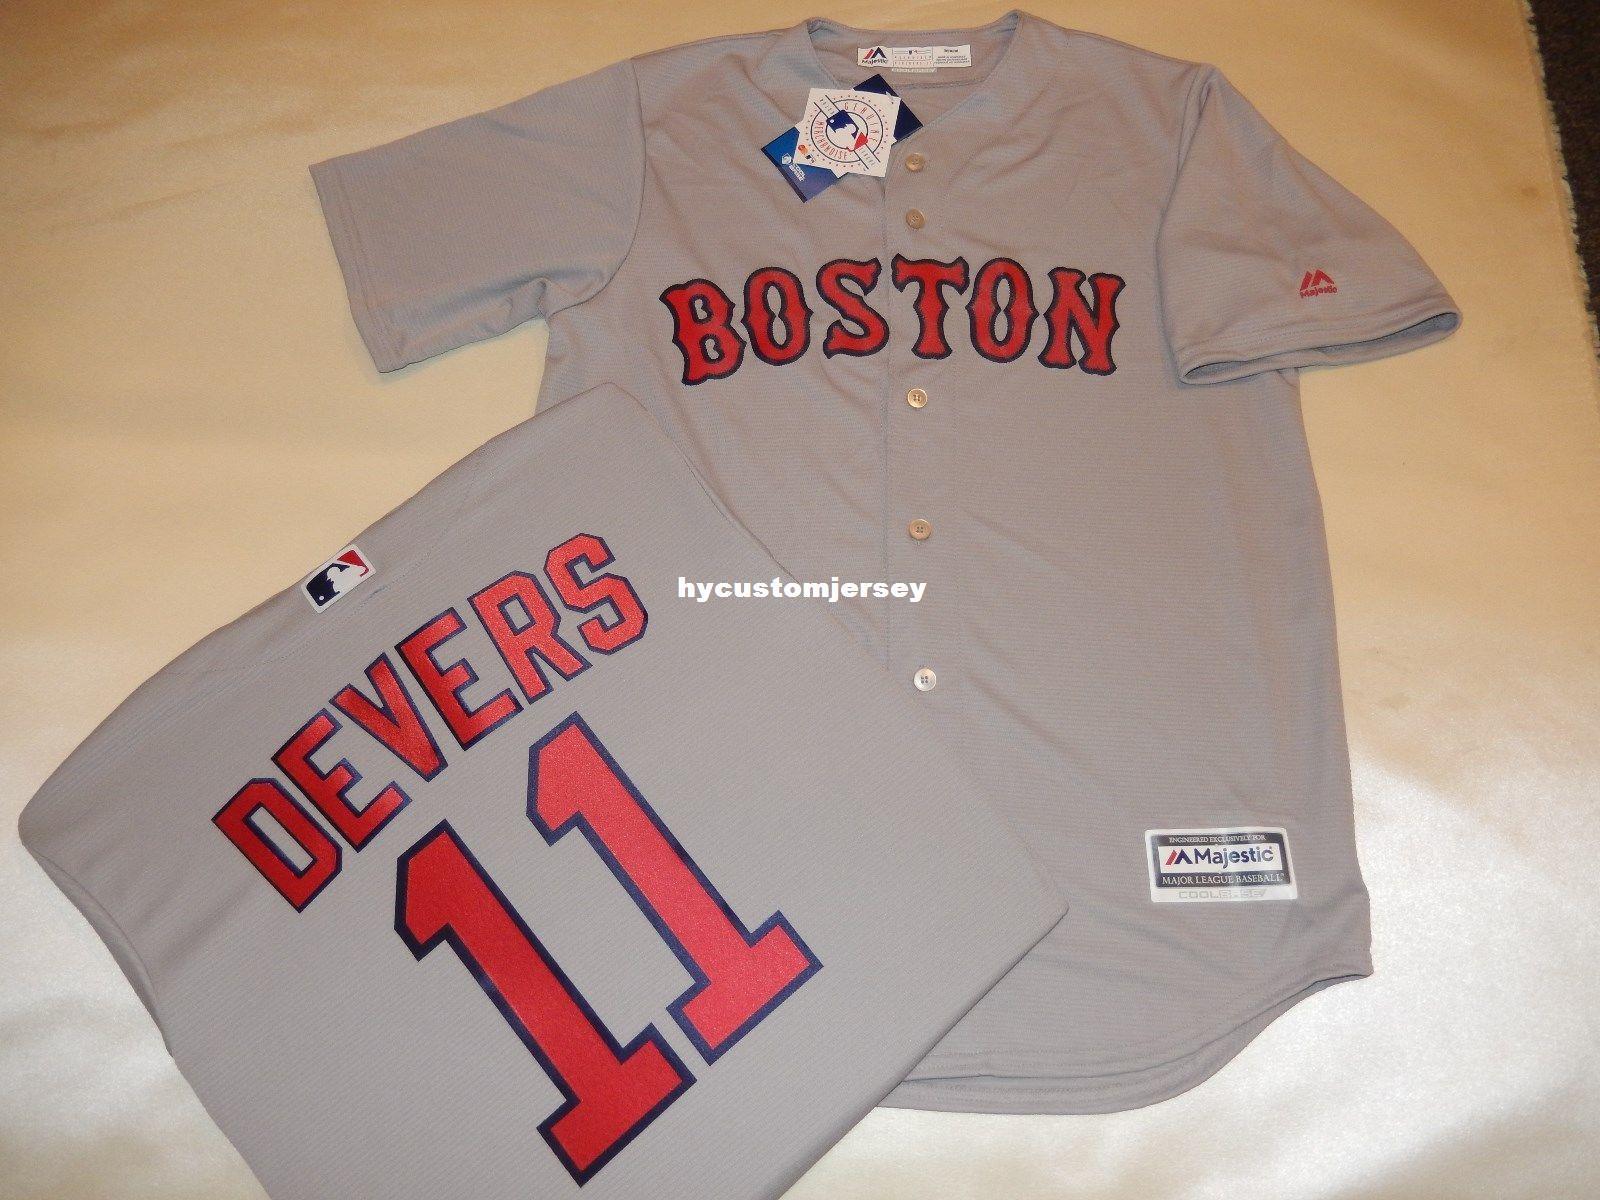 reputable site e9ca5 882f6 Cheap custom MAJESTIC Boston #11 RAFAEL DEVERS SEWN Cool Base Baseball  Jersey GRAY Mens stitched jerseys Big And Tall SIZE XS-6XL For sale